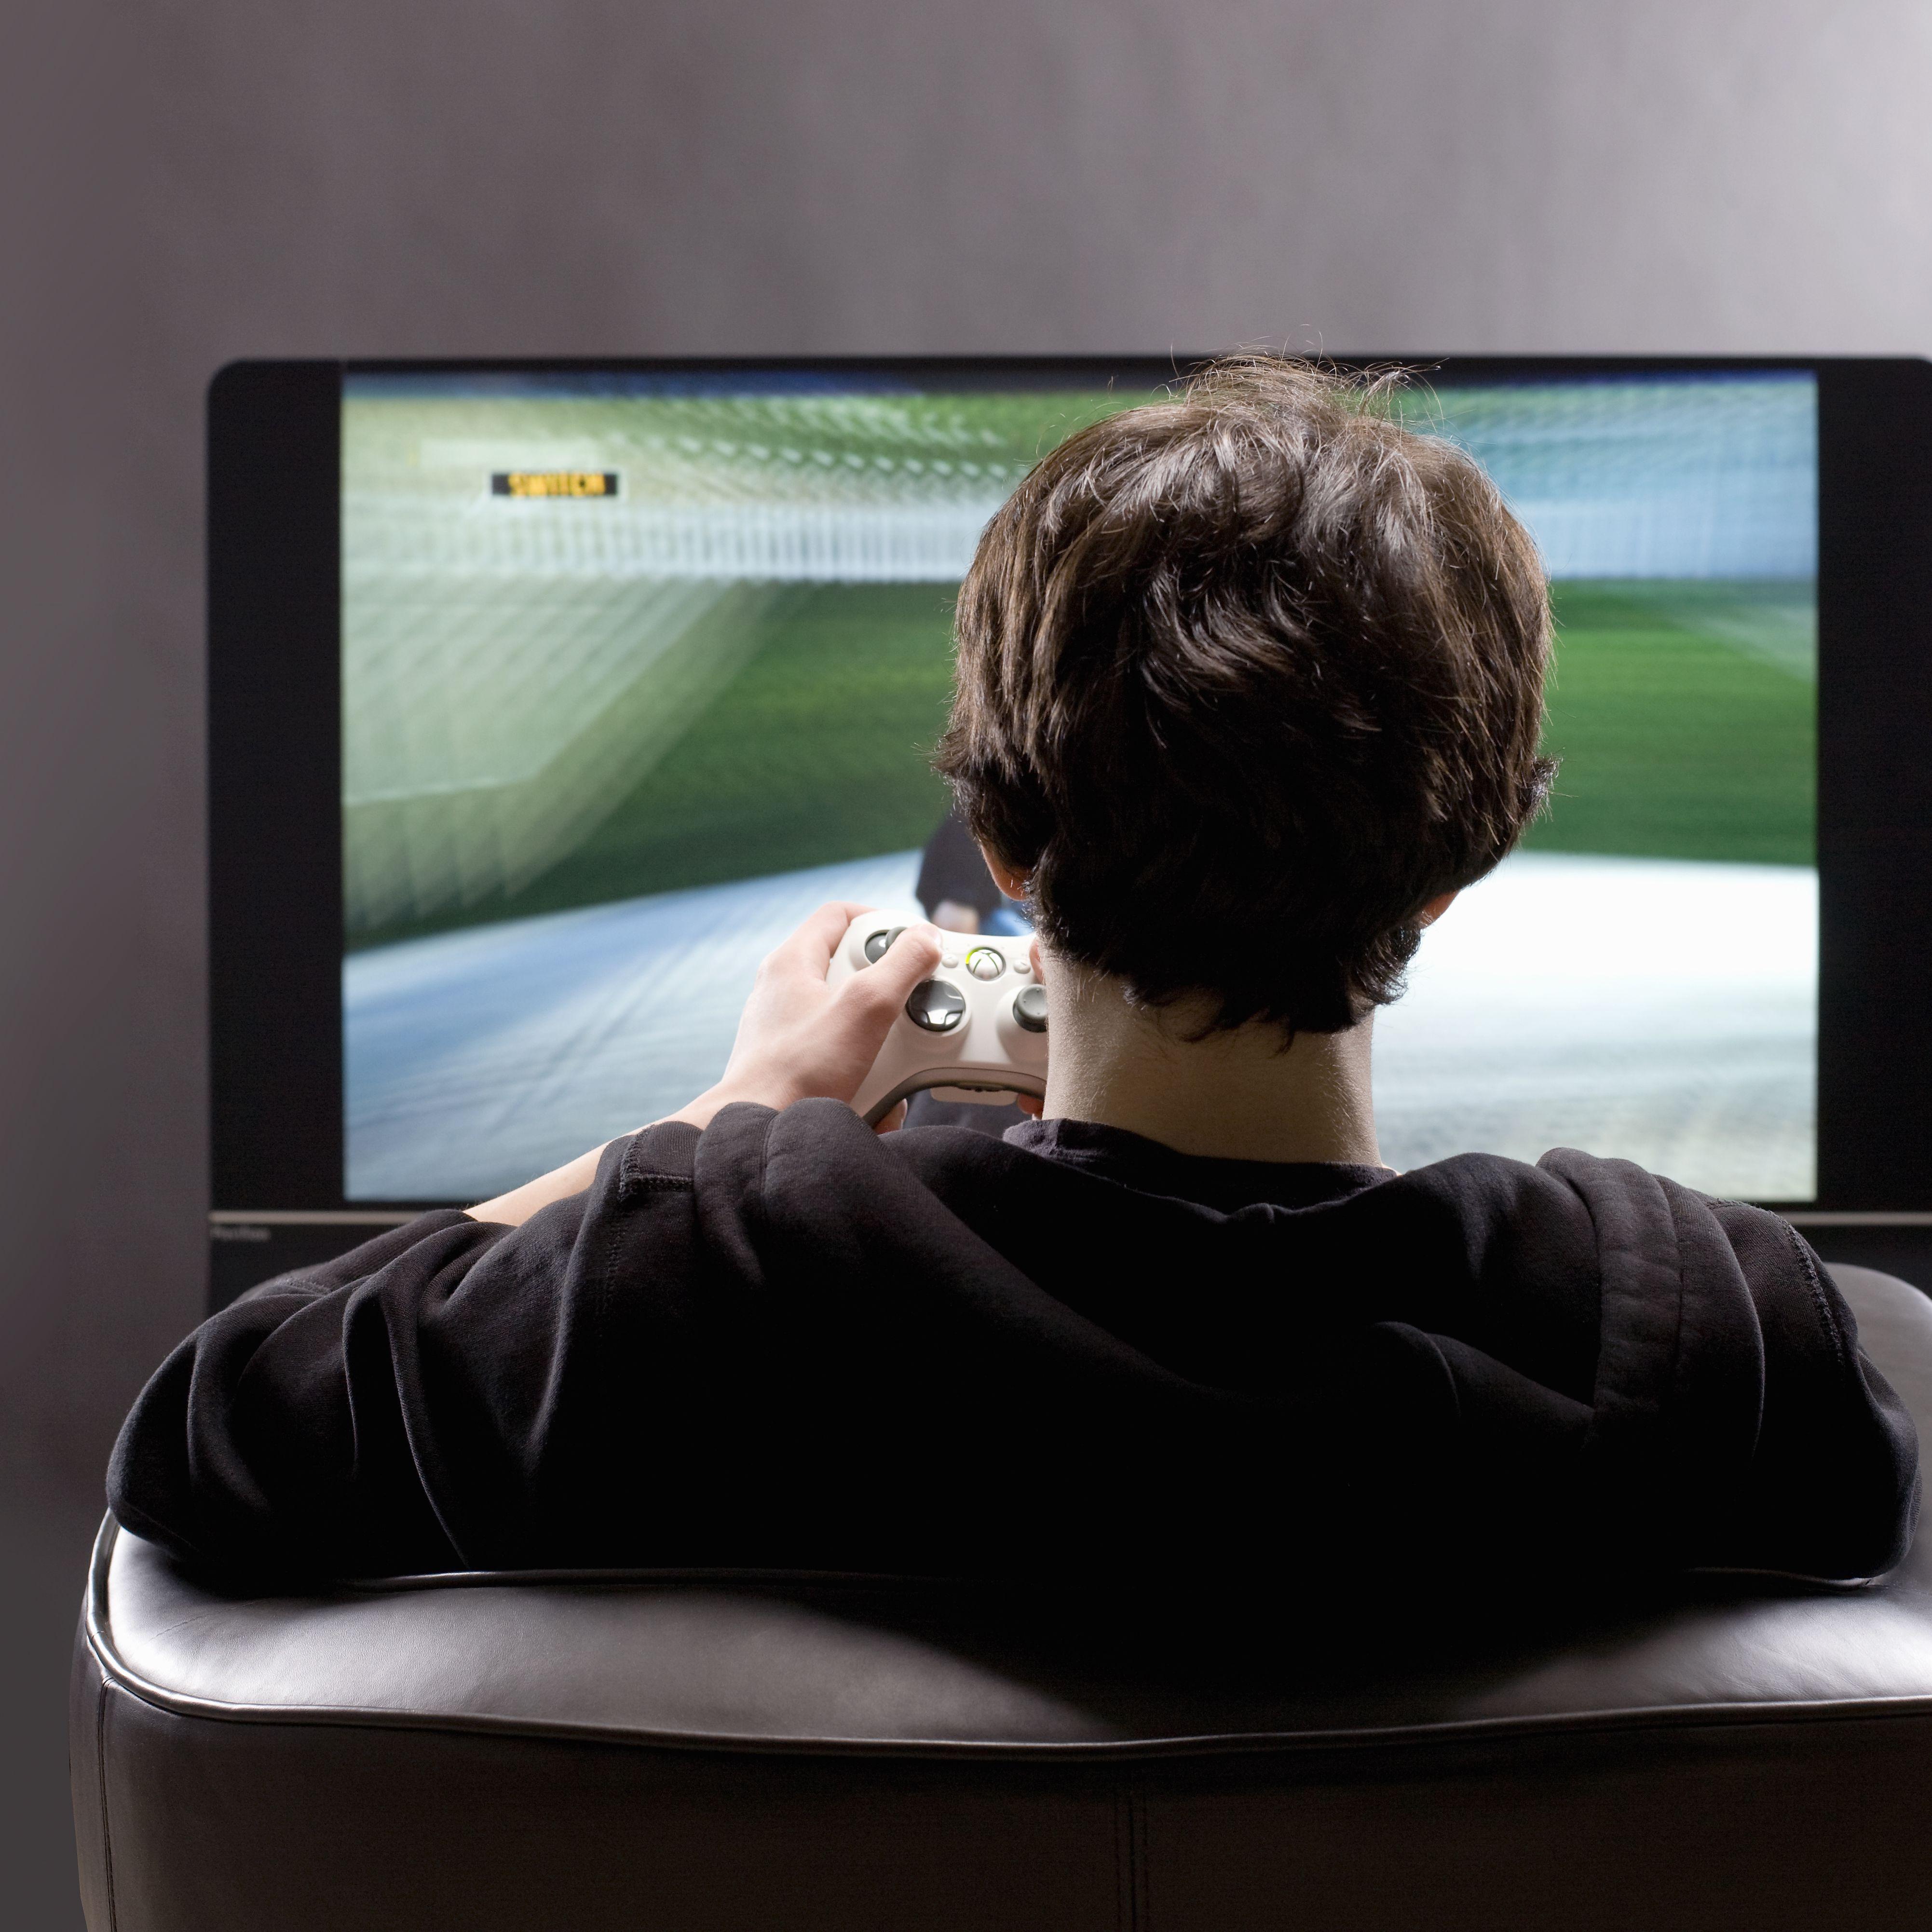 Steamy Kitchen - TCL Roku Smart LED TV Giveaway